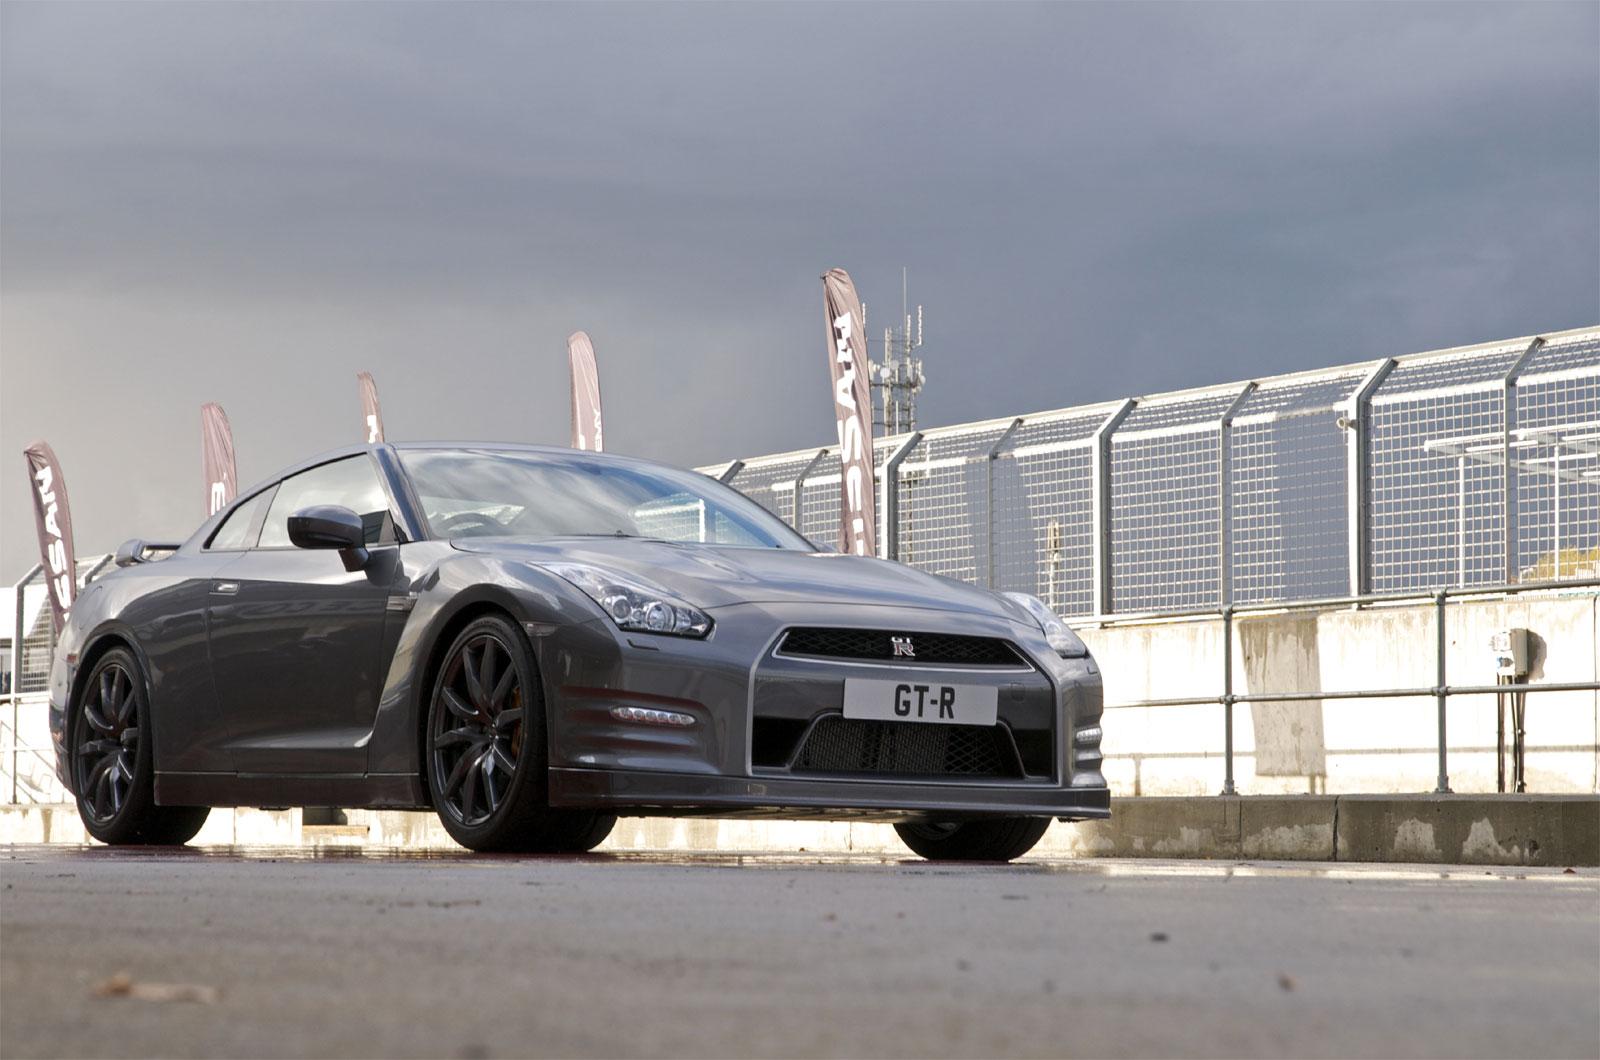 http://3.bp.blogspot.com/-ADI6PvkEZP8/T_h5Fbdmf8I/AAAAAAAAEQs/SUy2MtGOzmo/s1600/Nissan+GTR+Hd+Wallpapers+2013_1.jpg